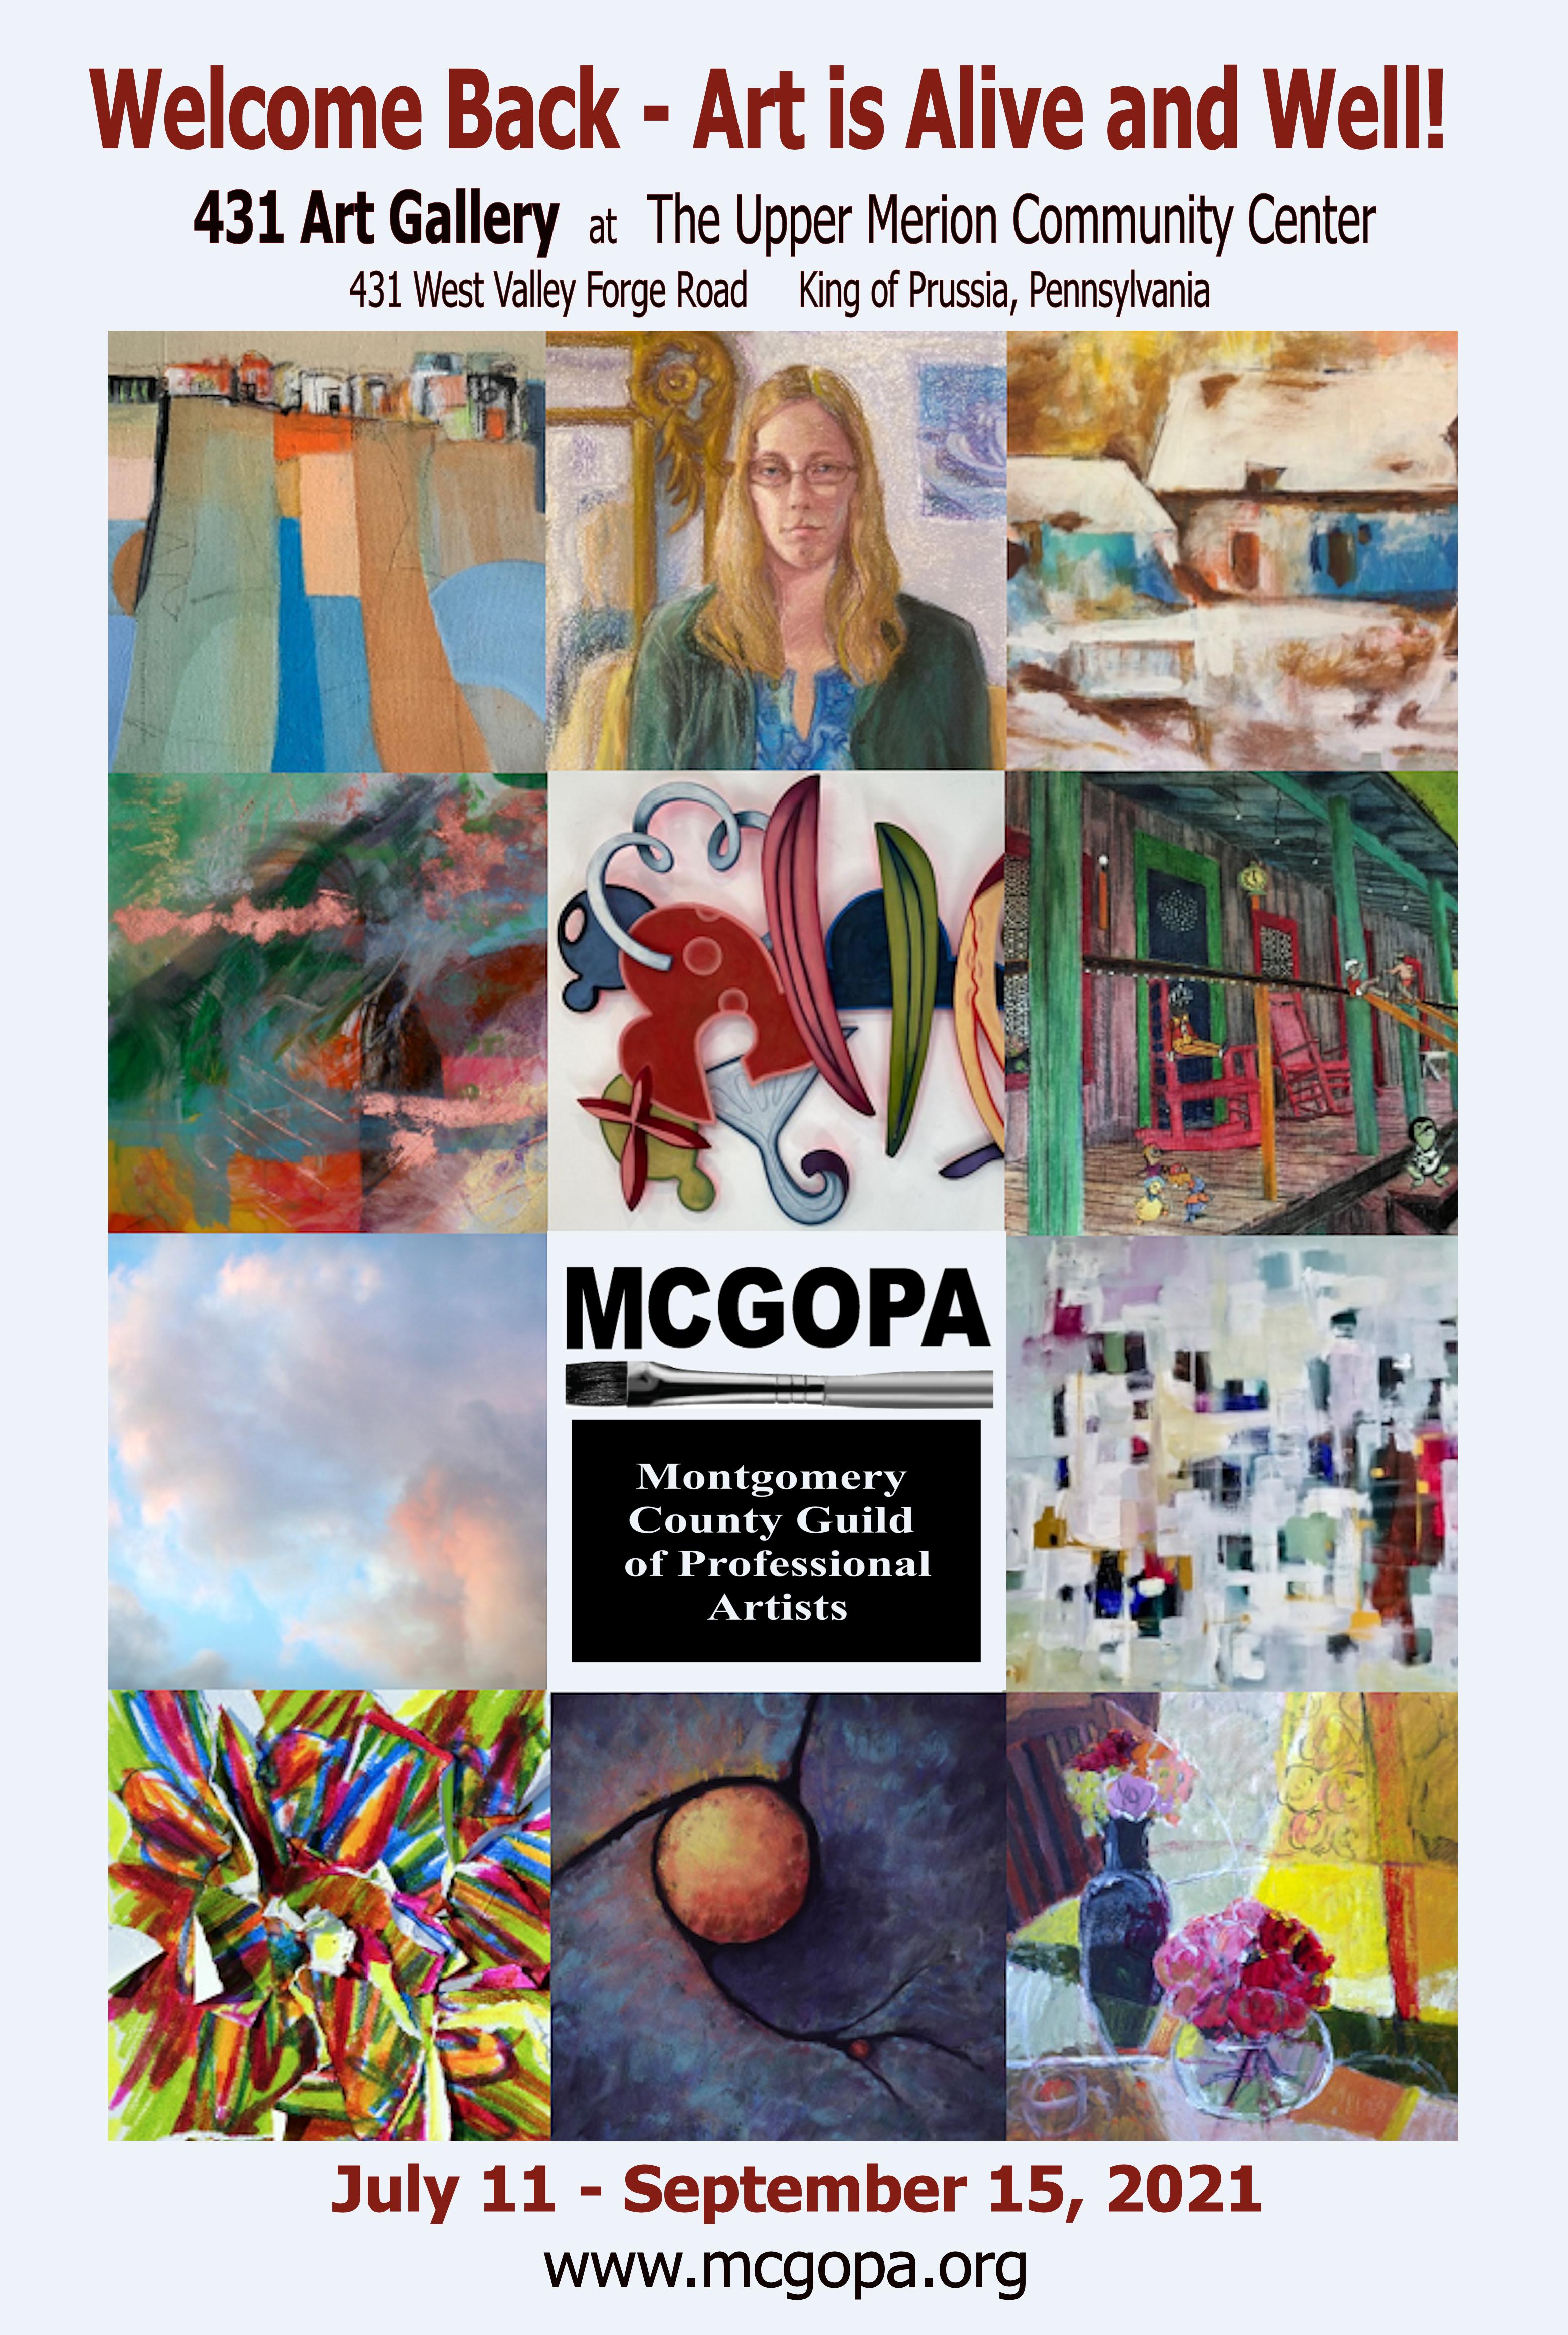 MCGOPA_2021_Welcome_Back_431